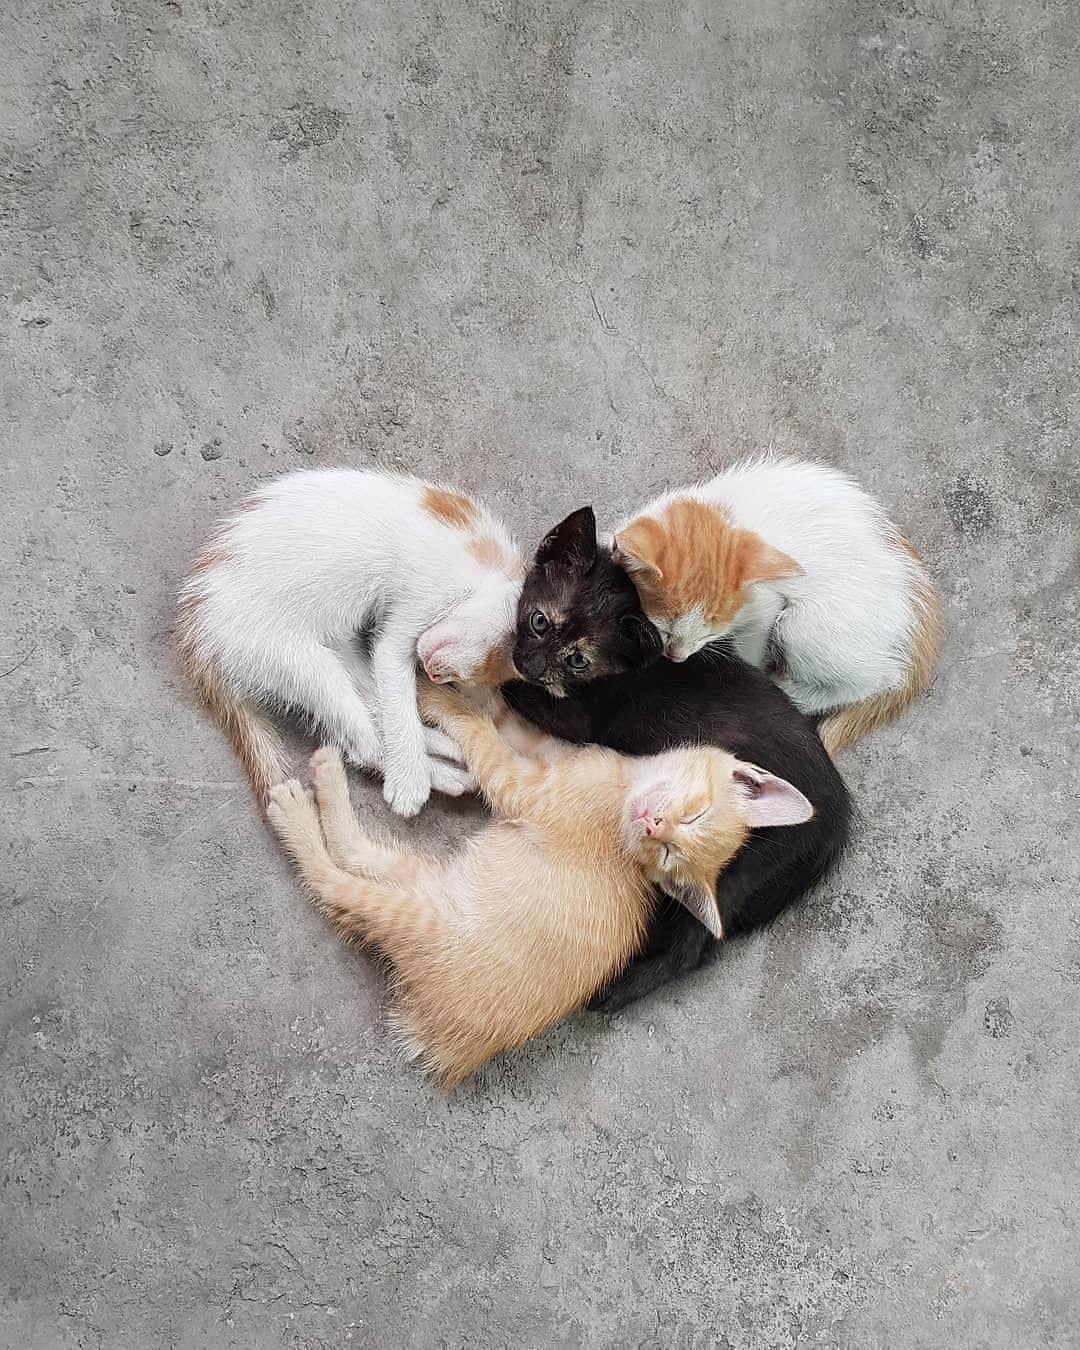 Beautiful Babies Kittens Cutest Sleeping Kitten Cute Cats